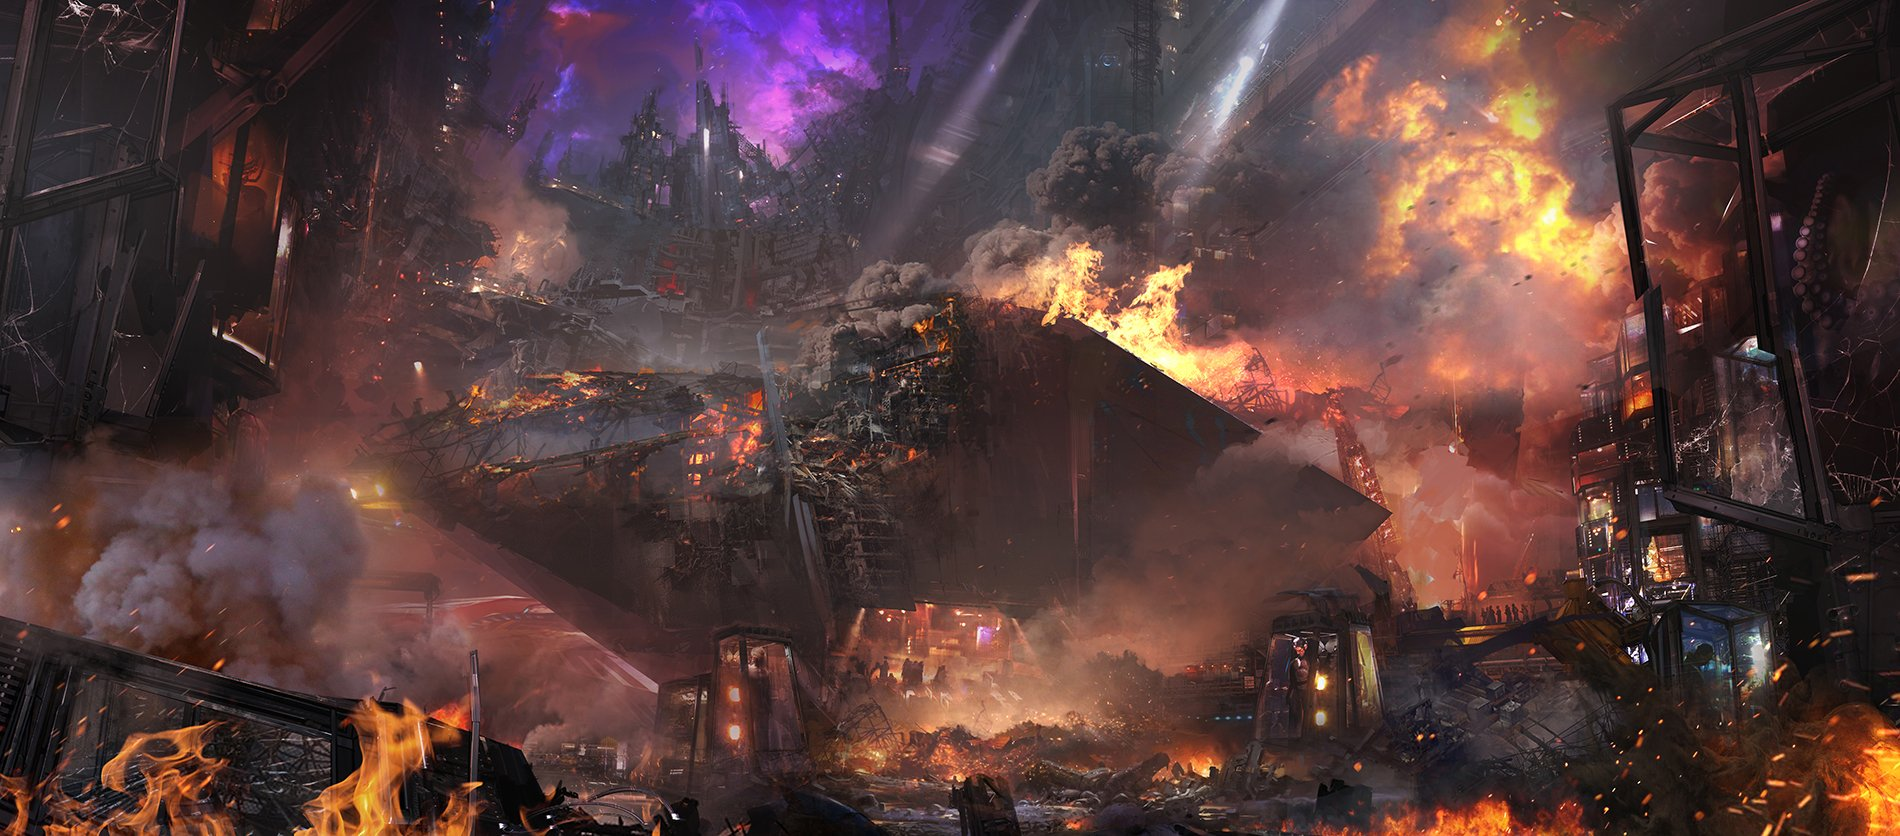 Концепт-арт Войны Бесконечности: Knowere evacuation destruction by Pete Thompson